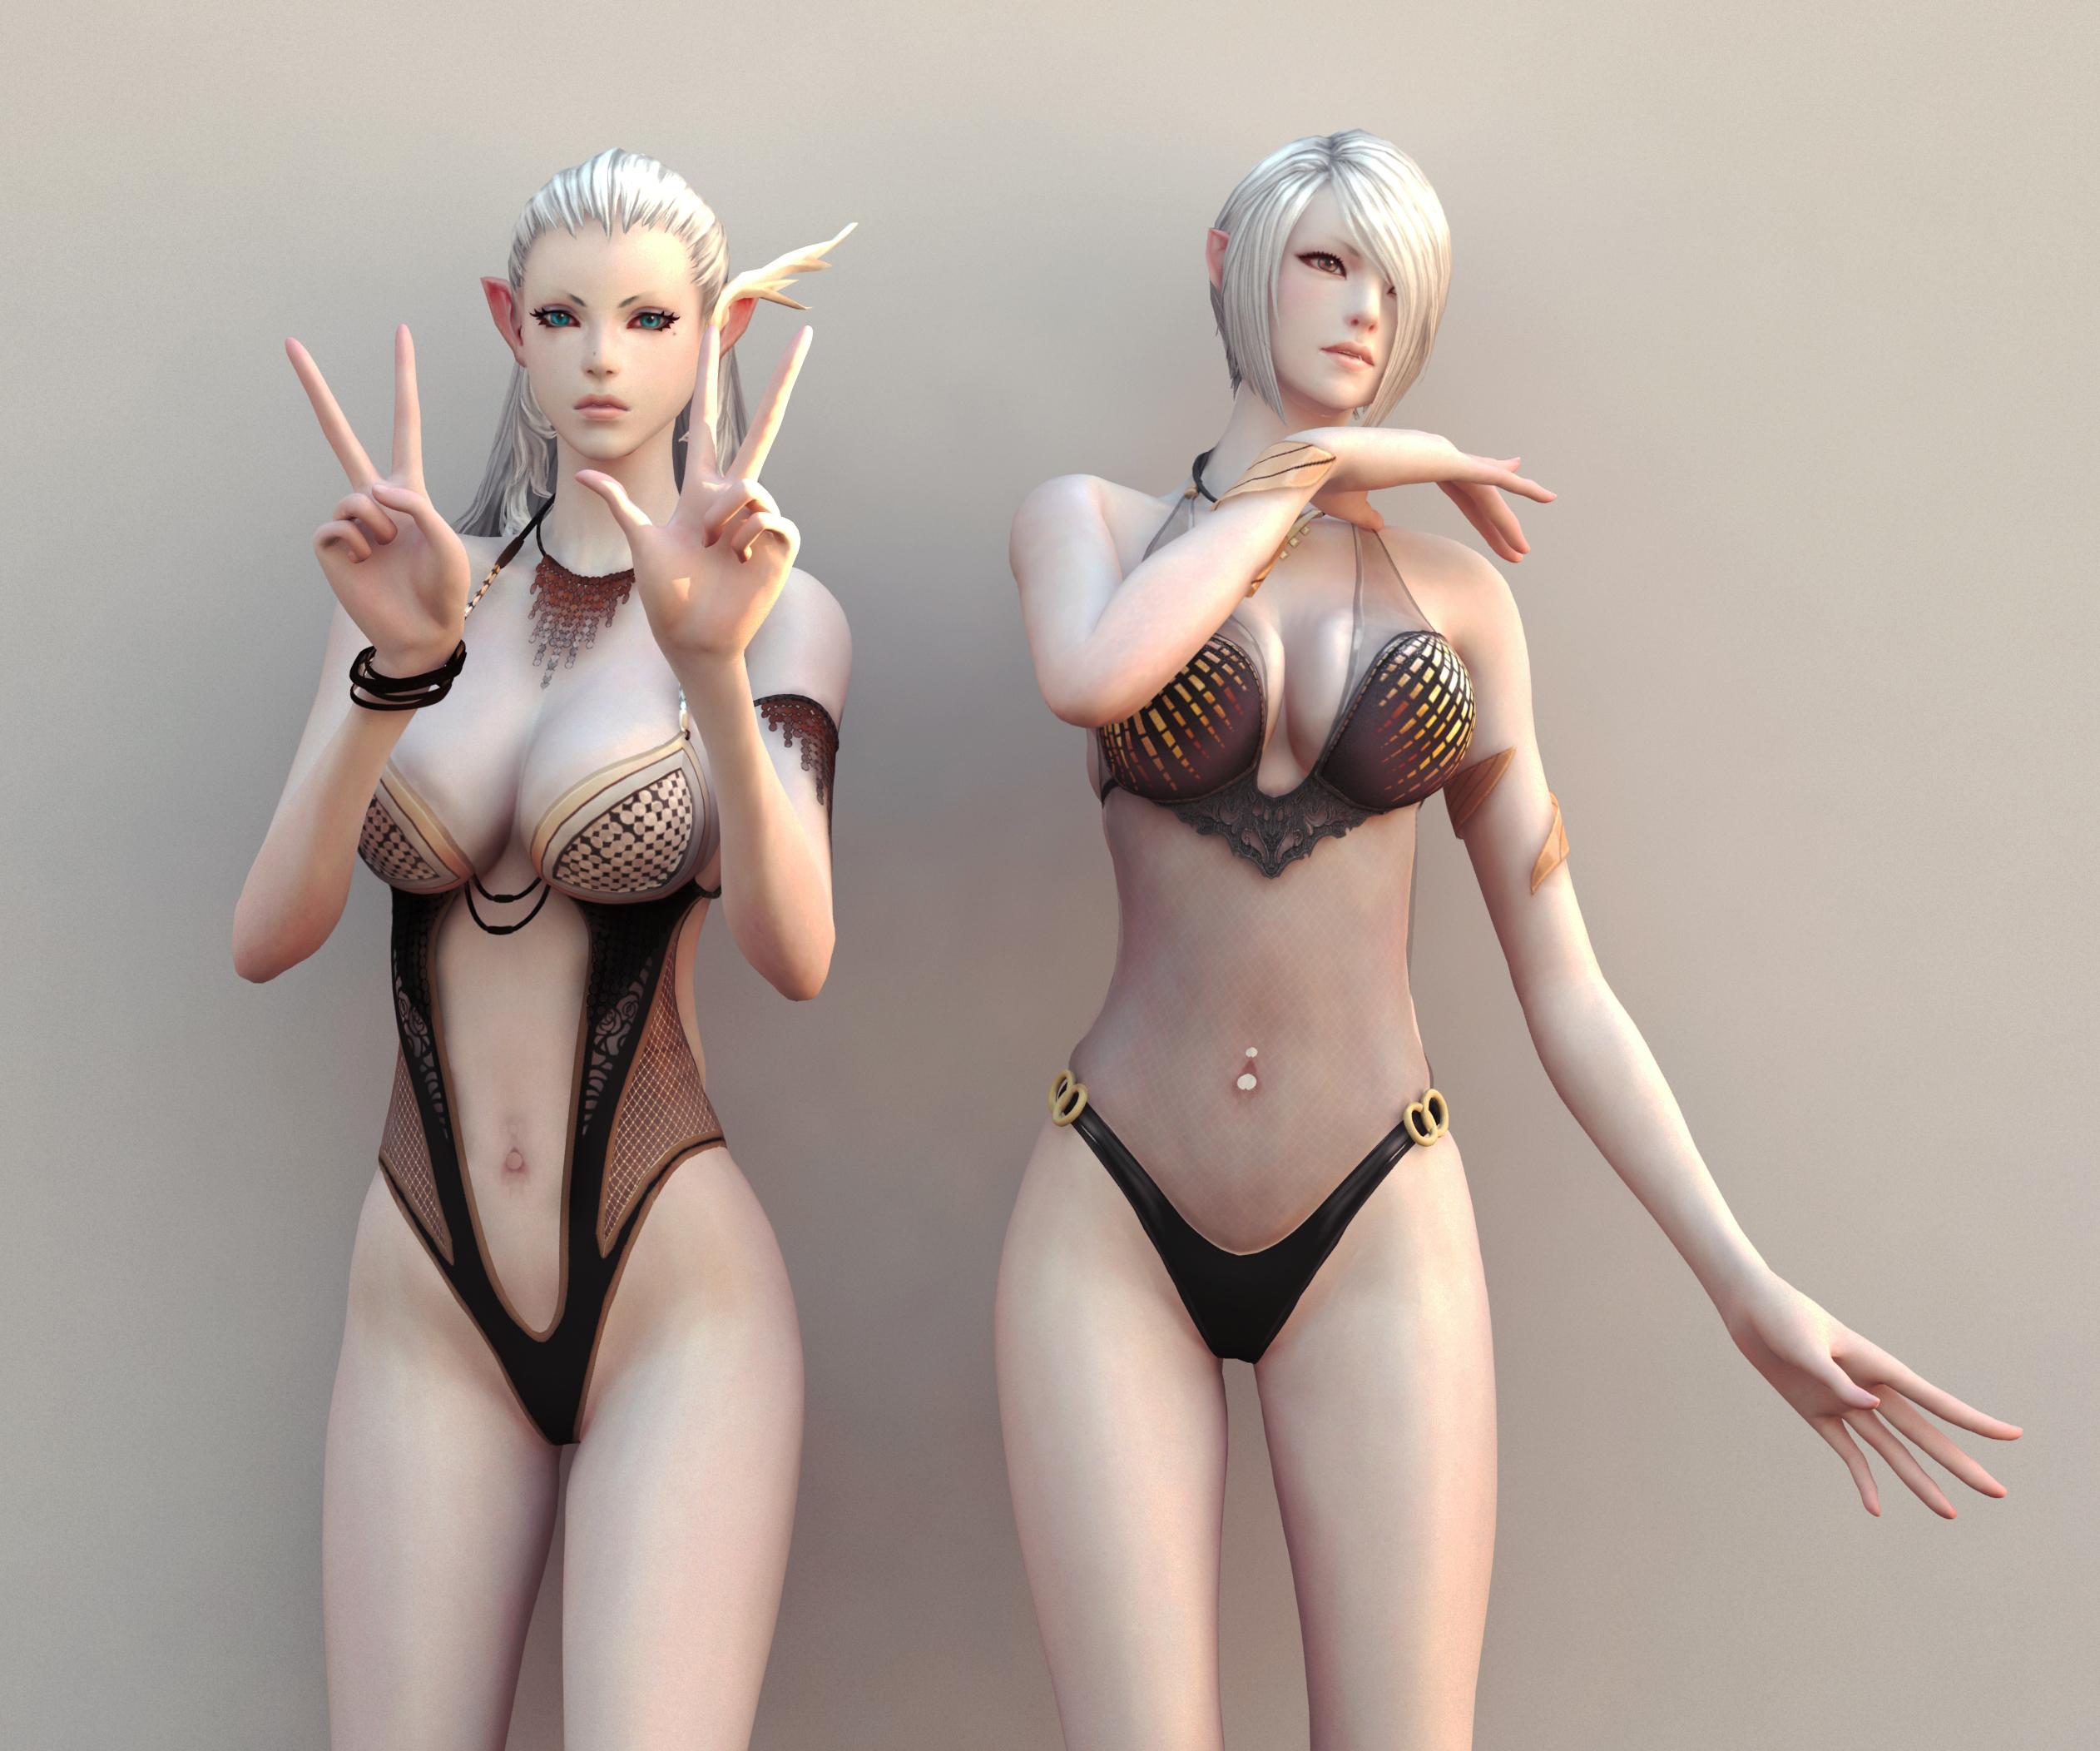 Random sluts from online collection 9